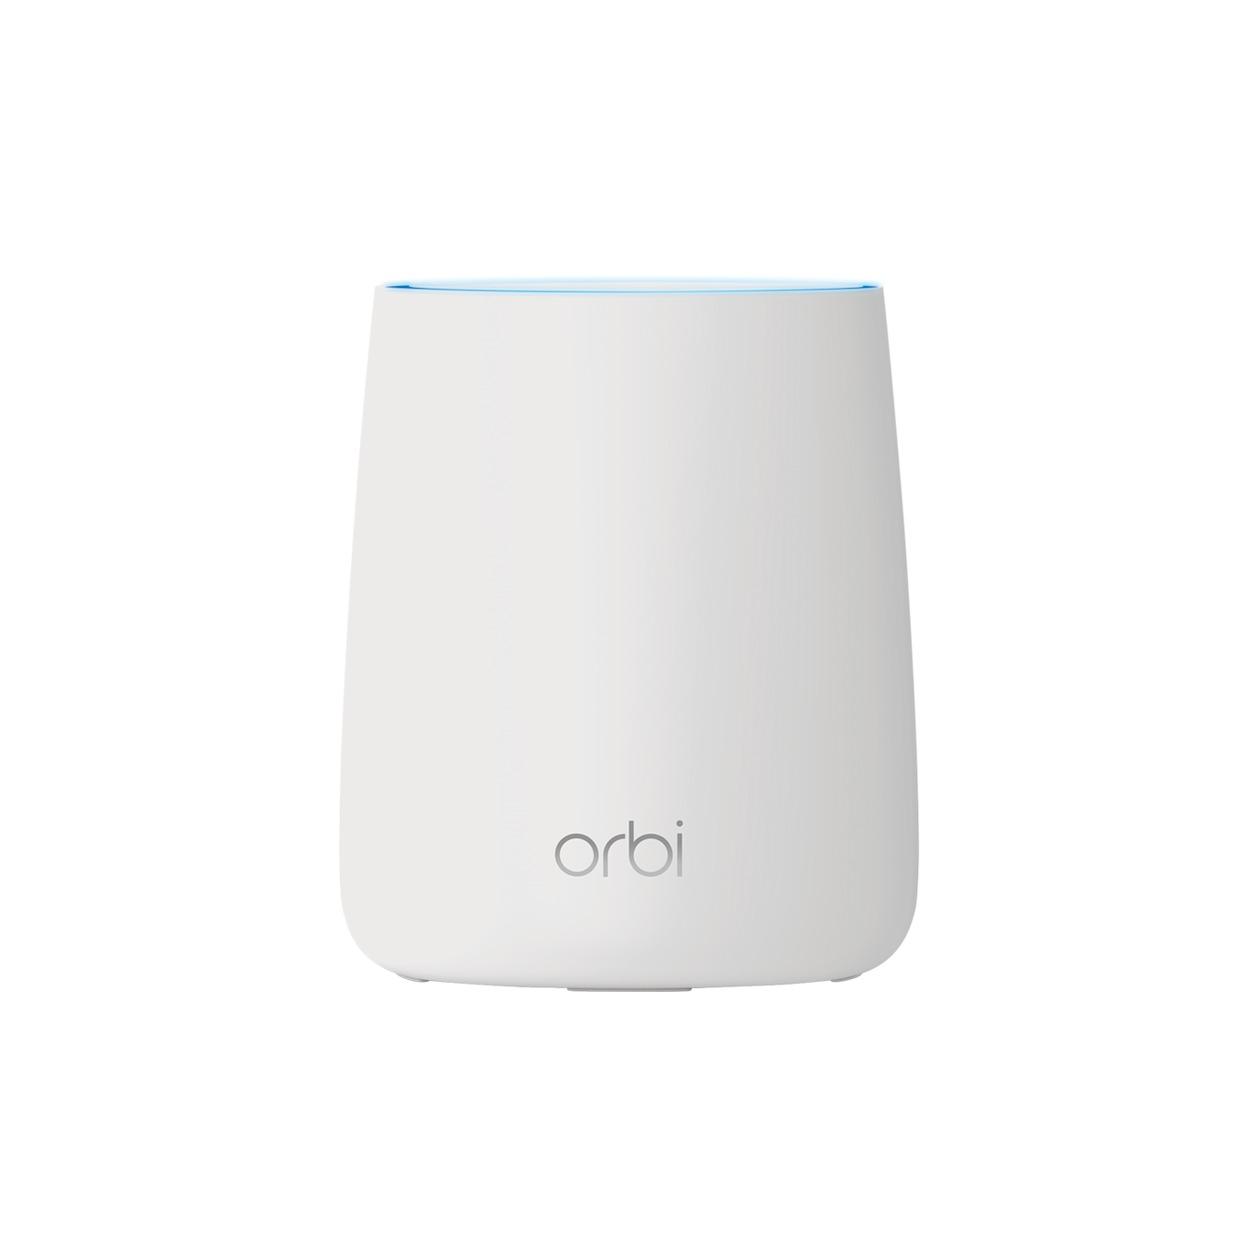 Netgear Orbi Whole Home AC2200-Tri-Band-WLAN